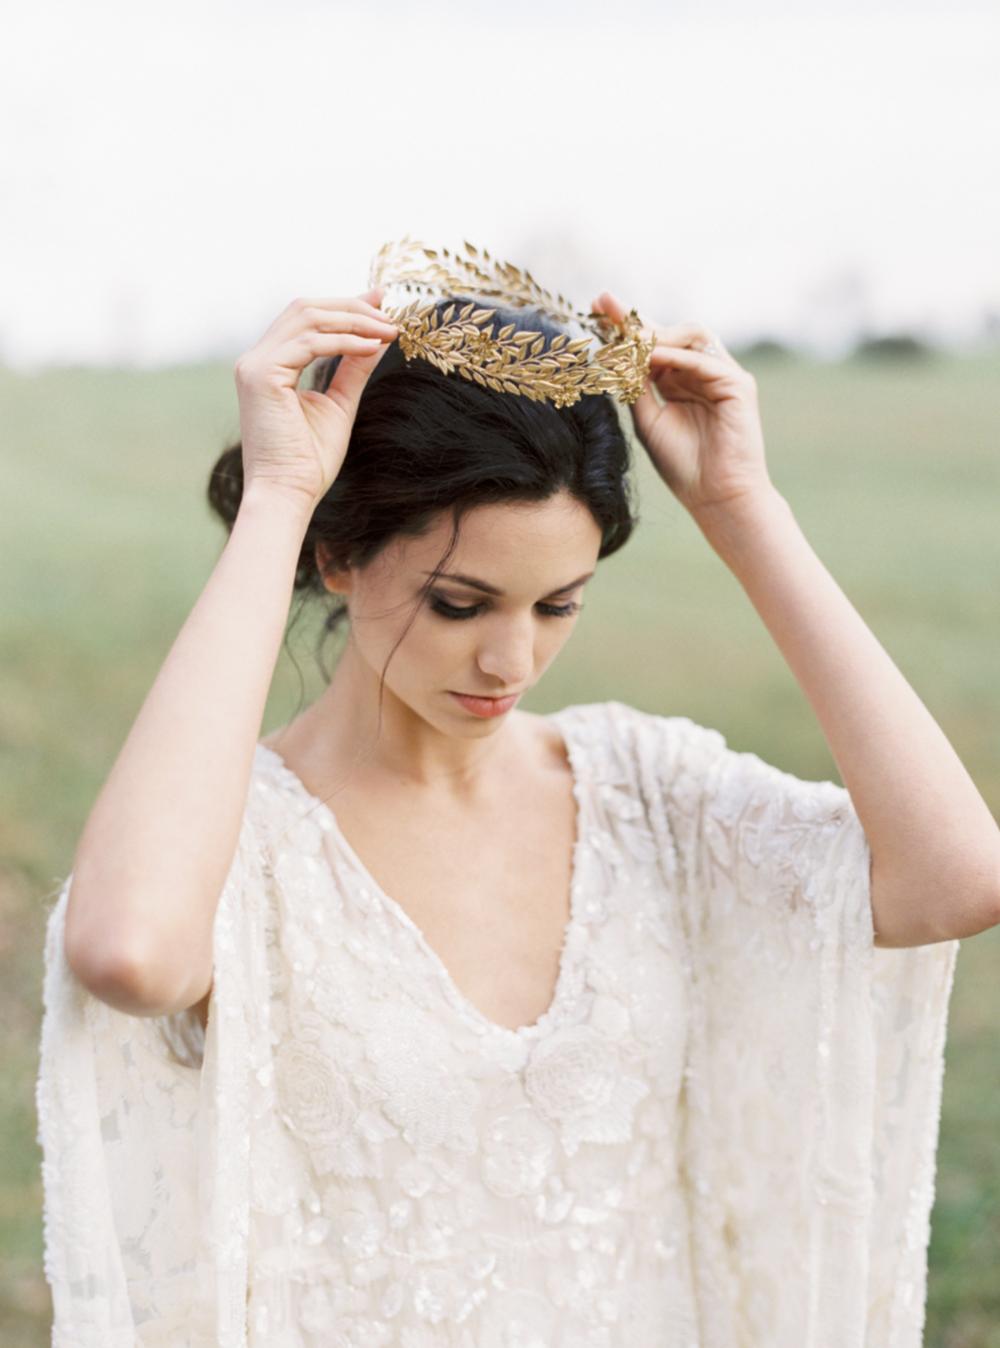 Carol Hannah Bridal Iolite Gown Shanon Moffit Photography 19.png